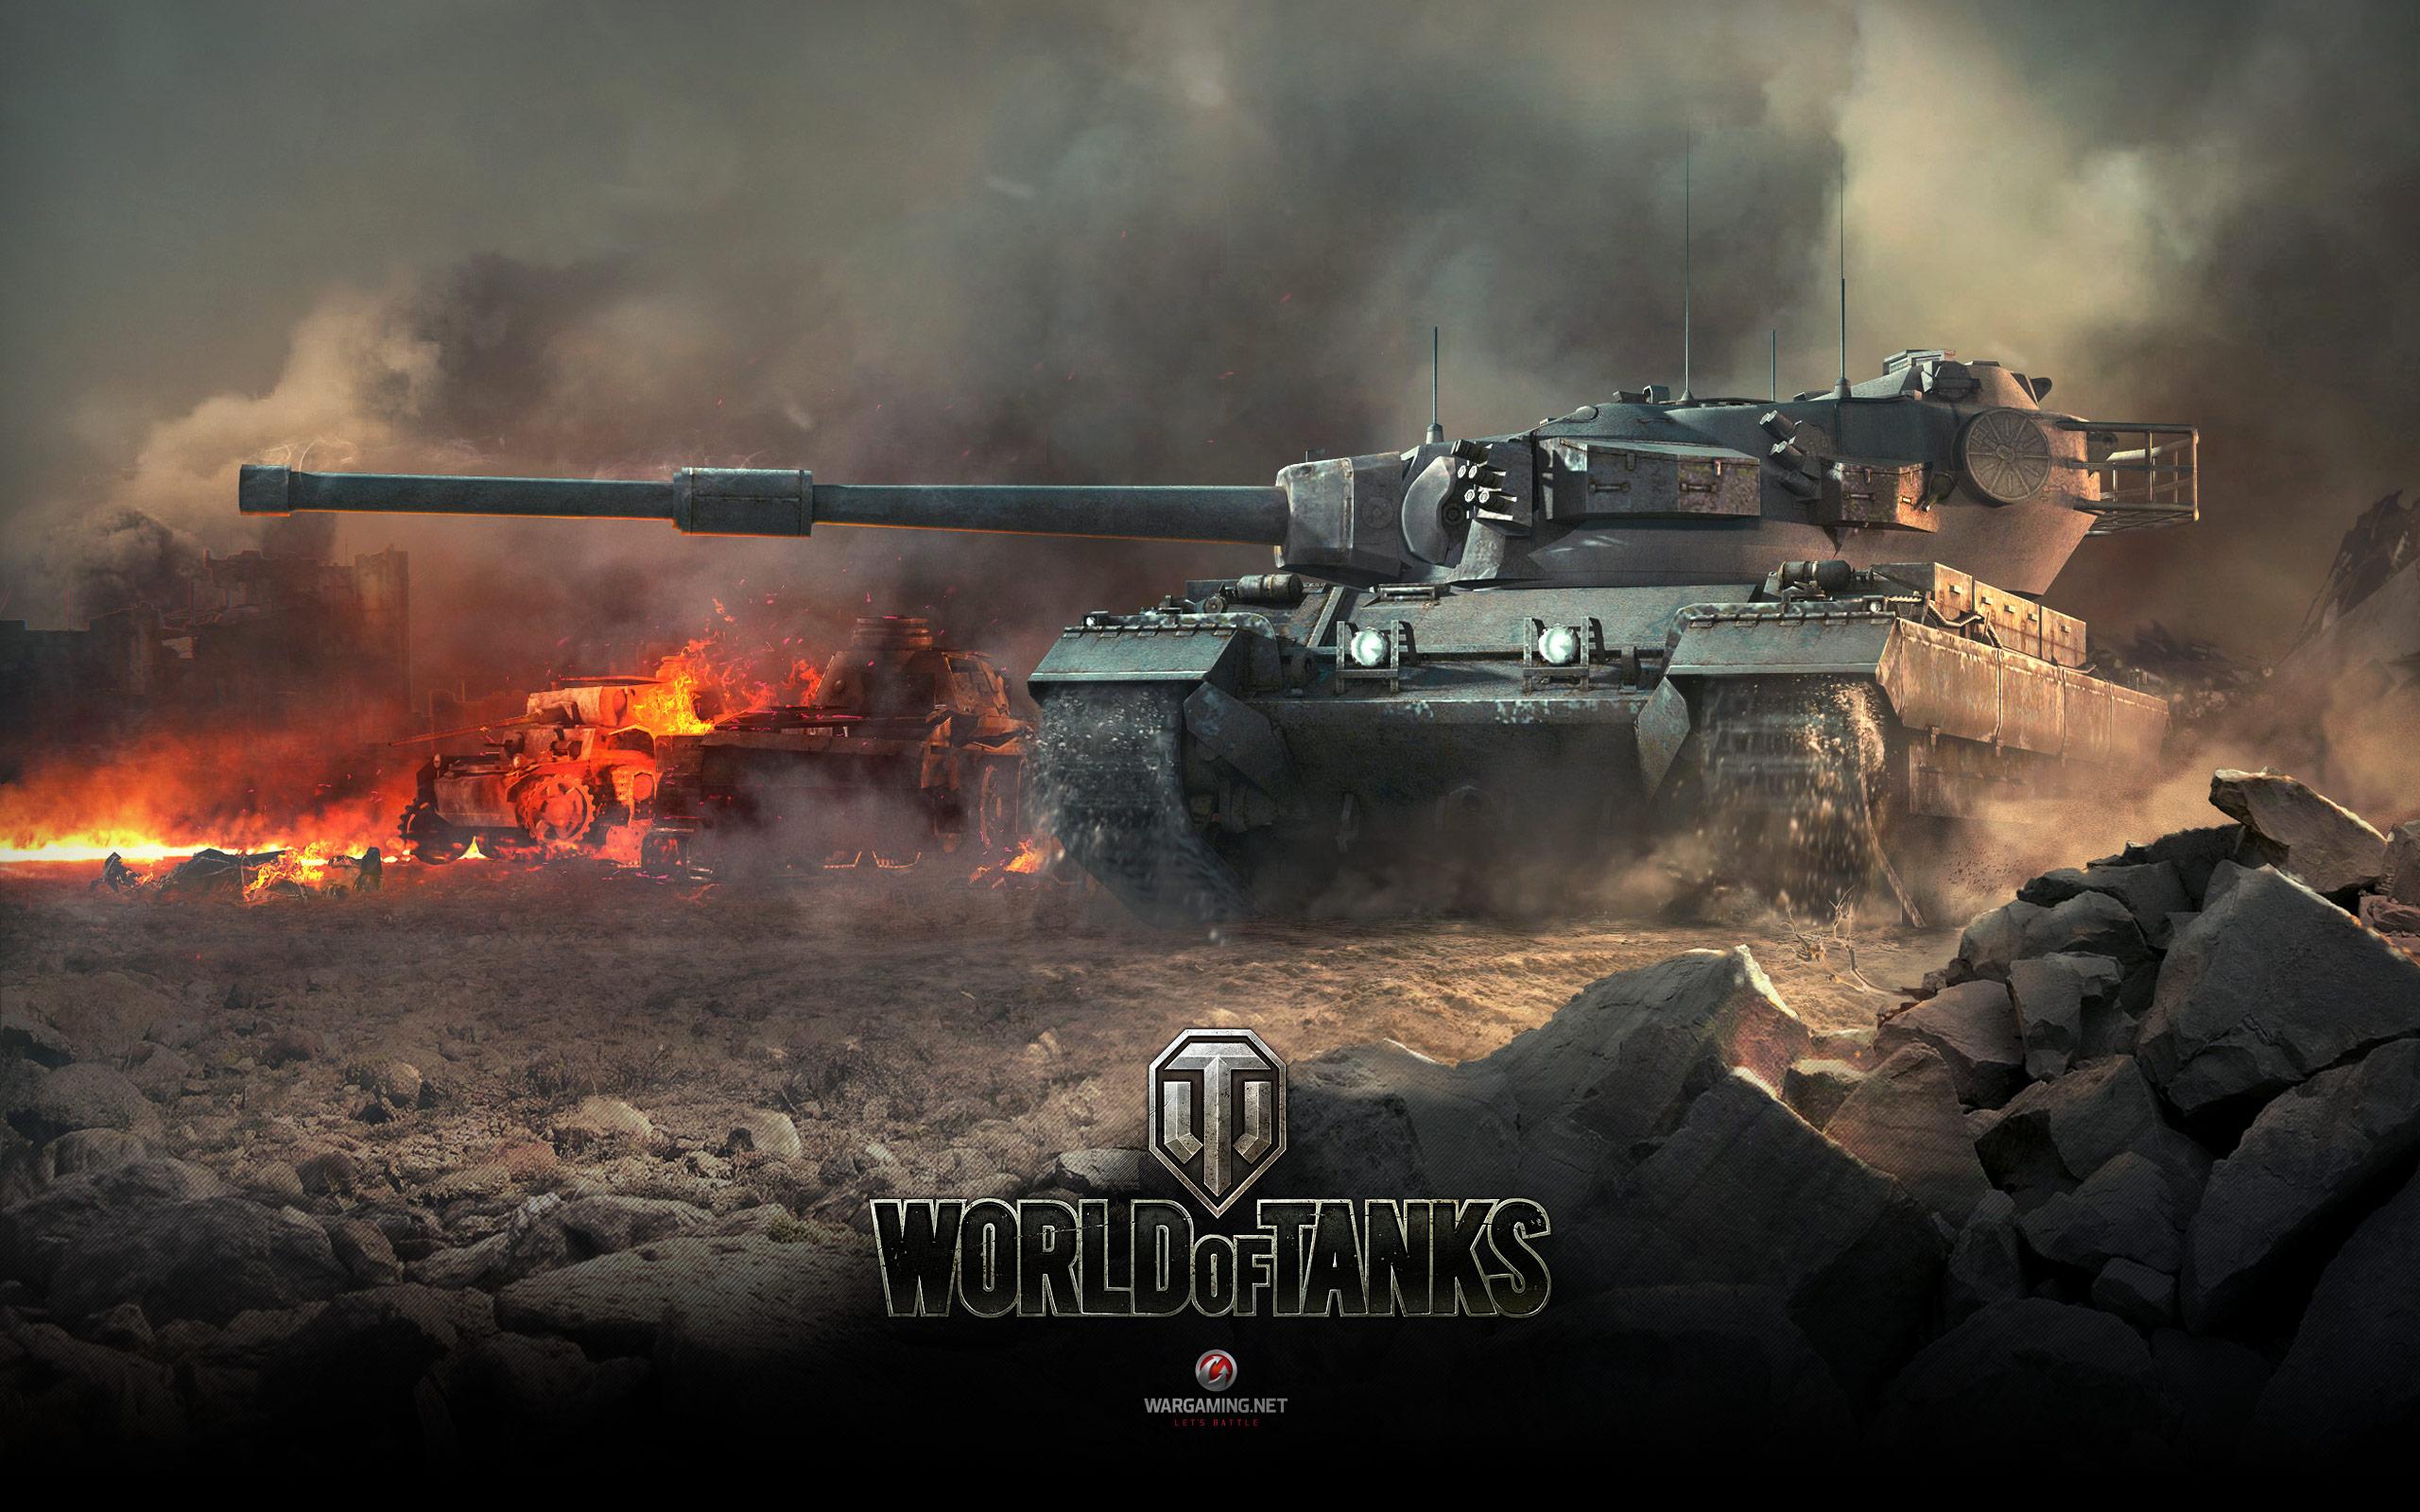 World Of Tanks Wallpaper HD #6921230